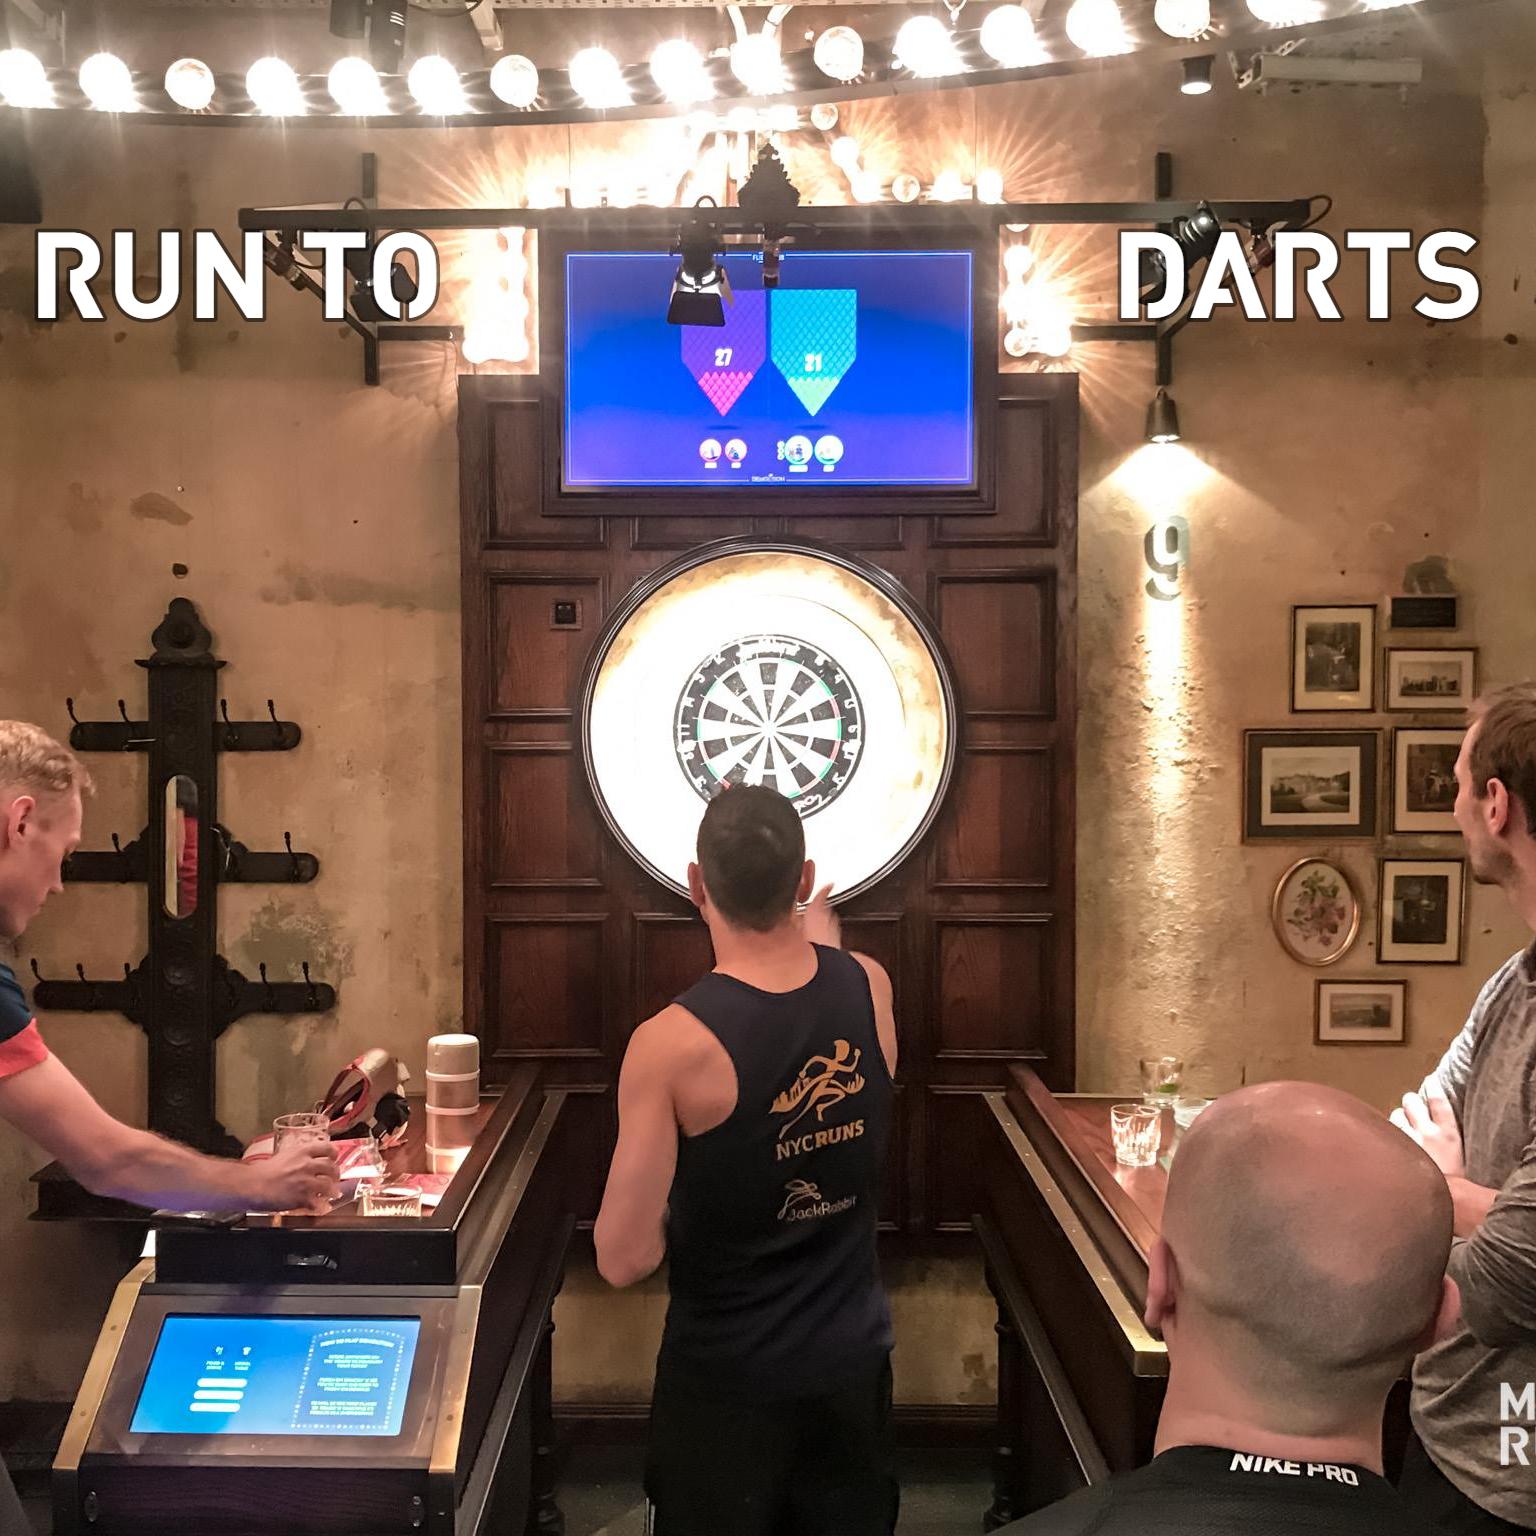 run_to_darts_MB.jpg